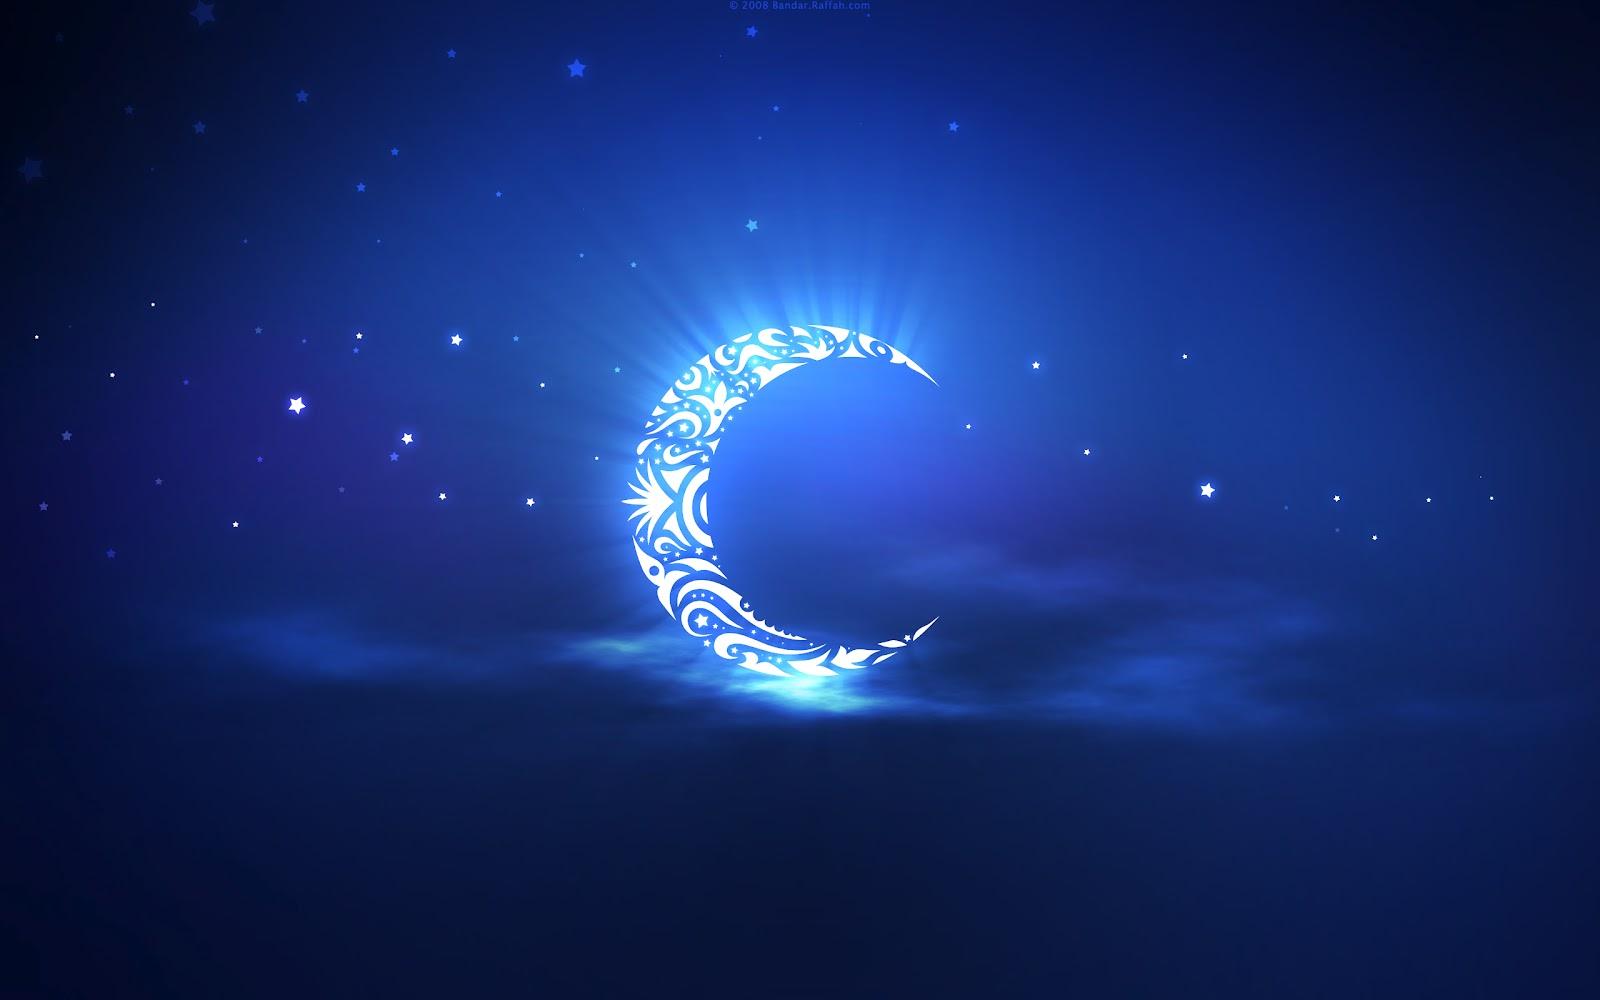 http://2.bp.blogspot.com/-x15yTFa3WKk/UCd4MJMgyAI/AAAAAAAAAXY/PNXeNtcr19o/s1600/ramadan-kareem-wallpaper.jpg